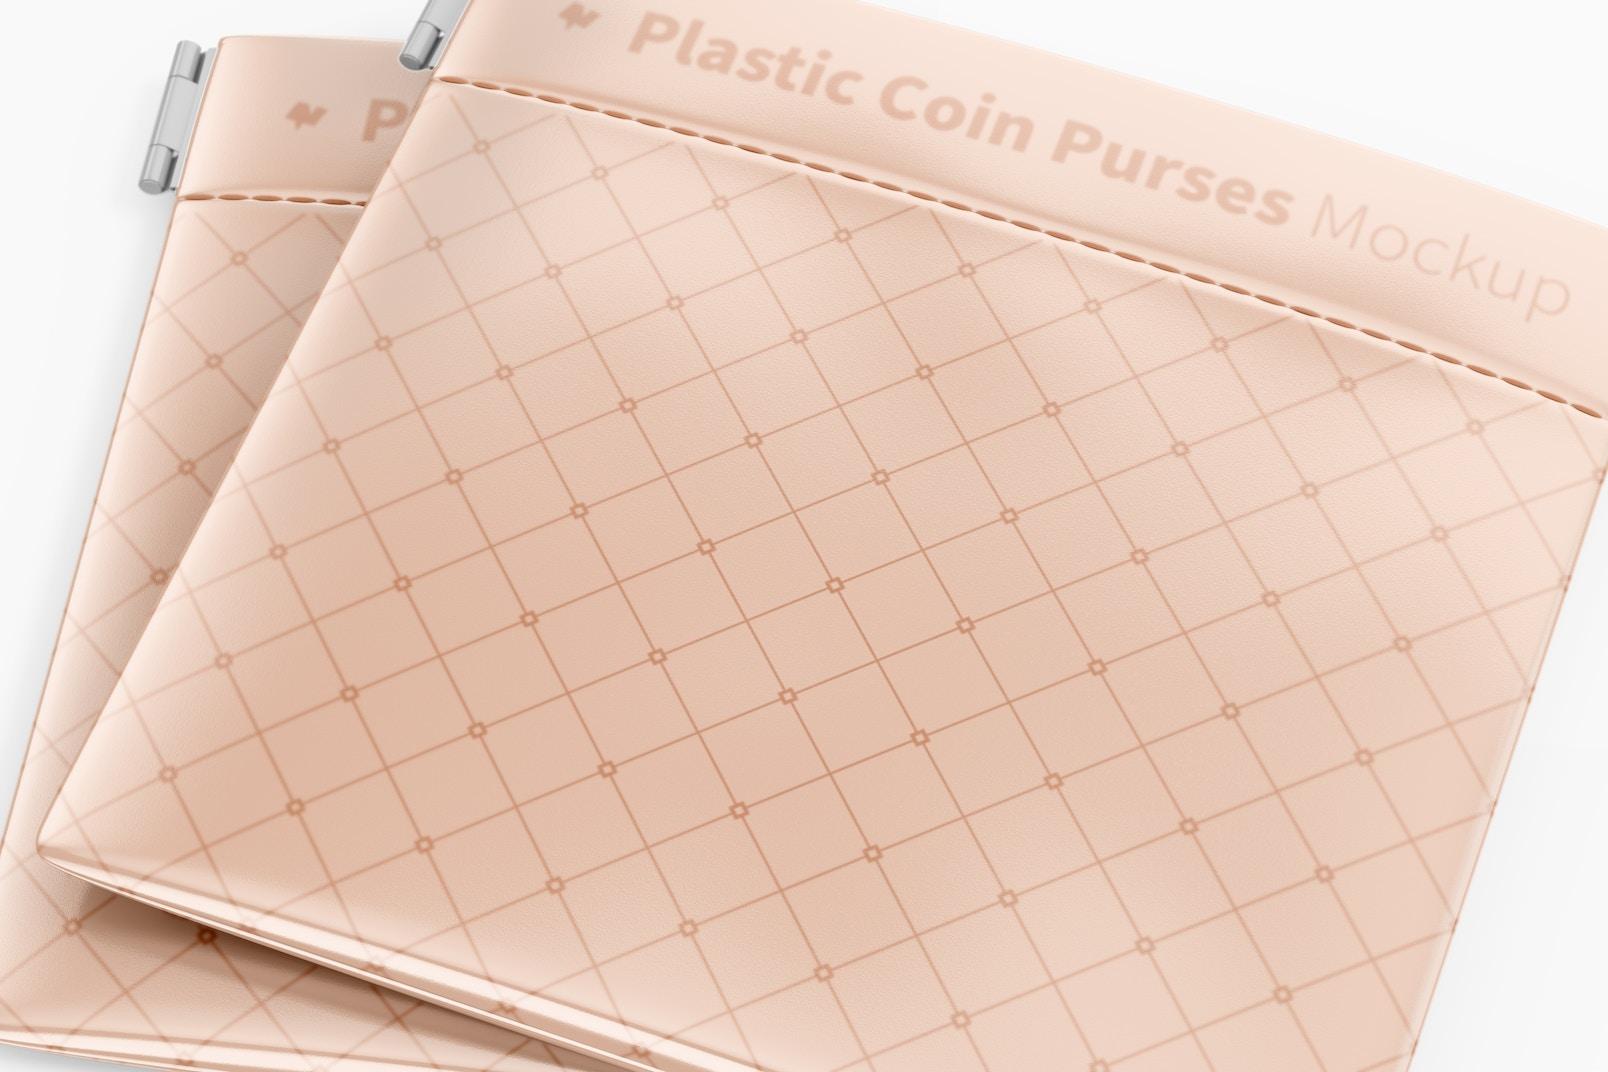 Plastic Coin Purse Mockup, Close Up